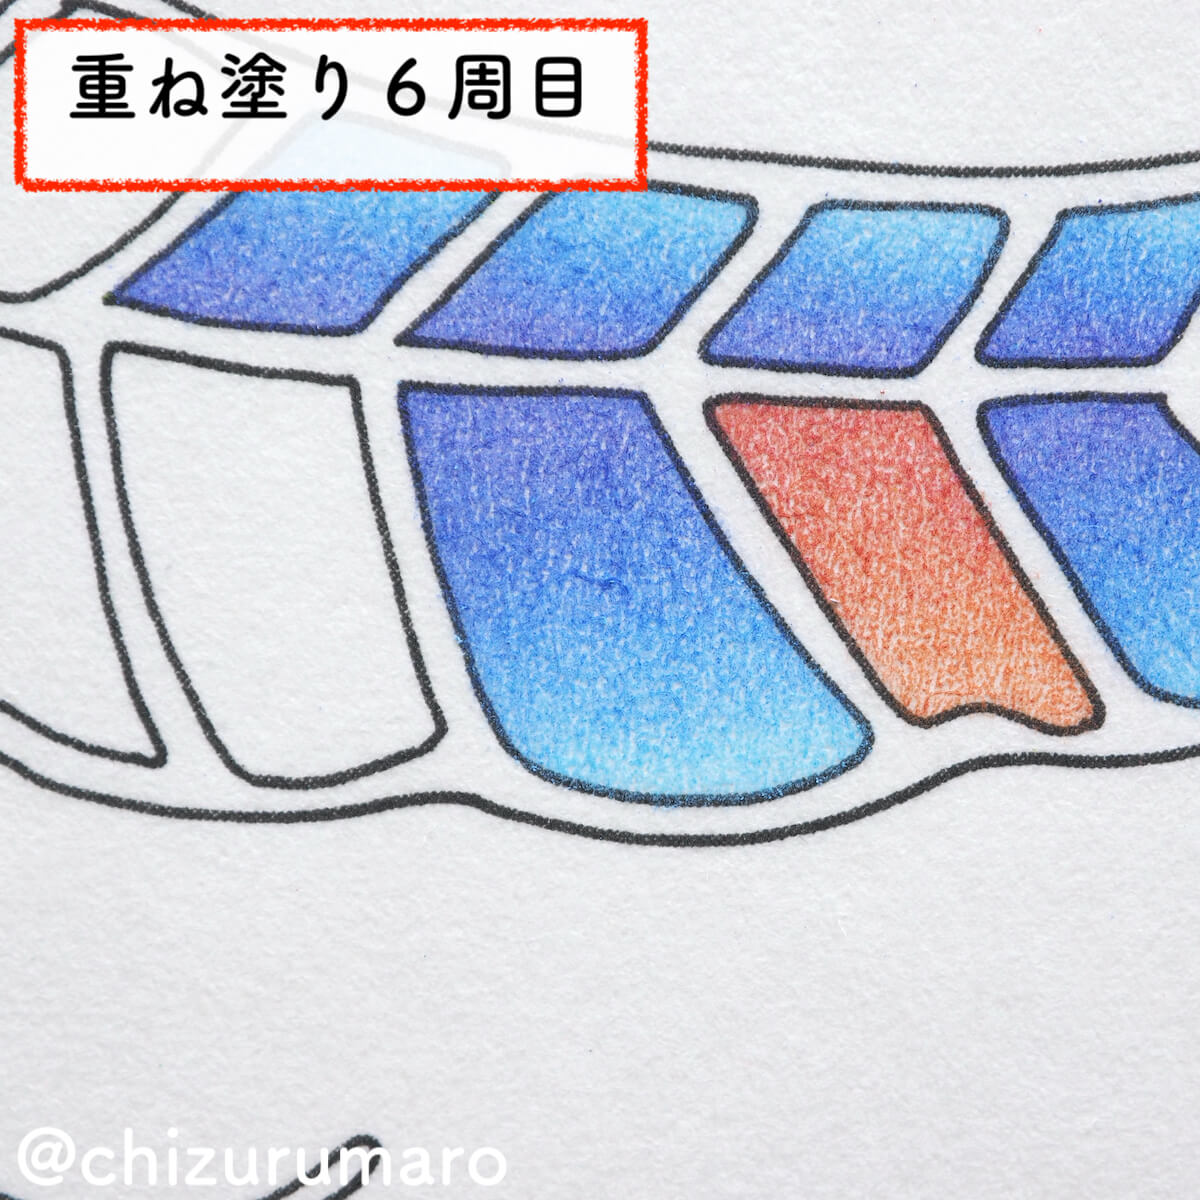 f:id:chizurumaro:20200609144005j:plain